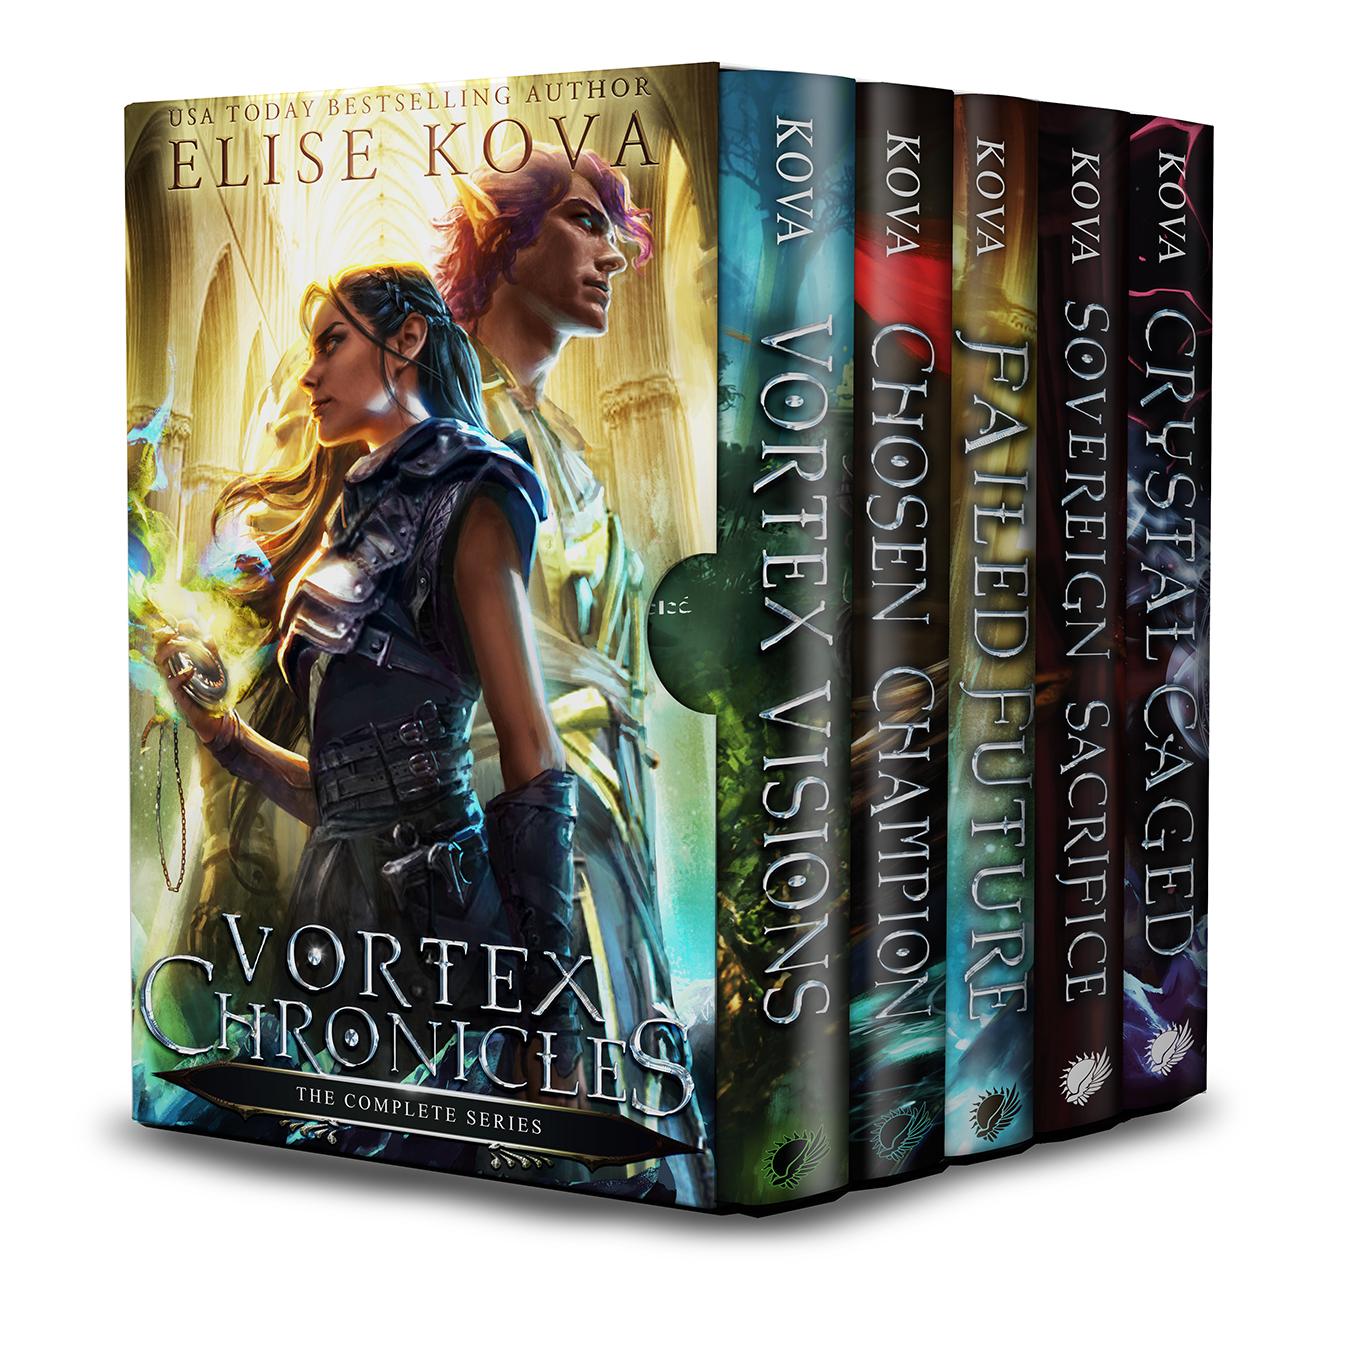 Vortex Chronicles Box Set